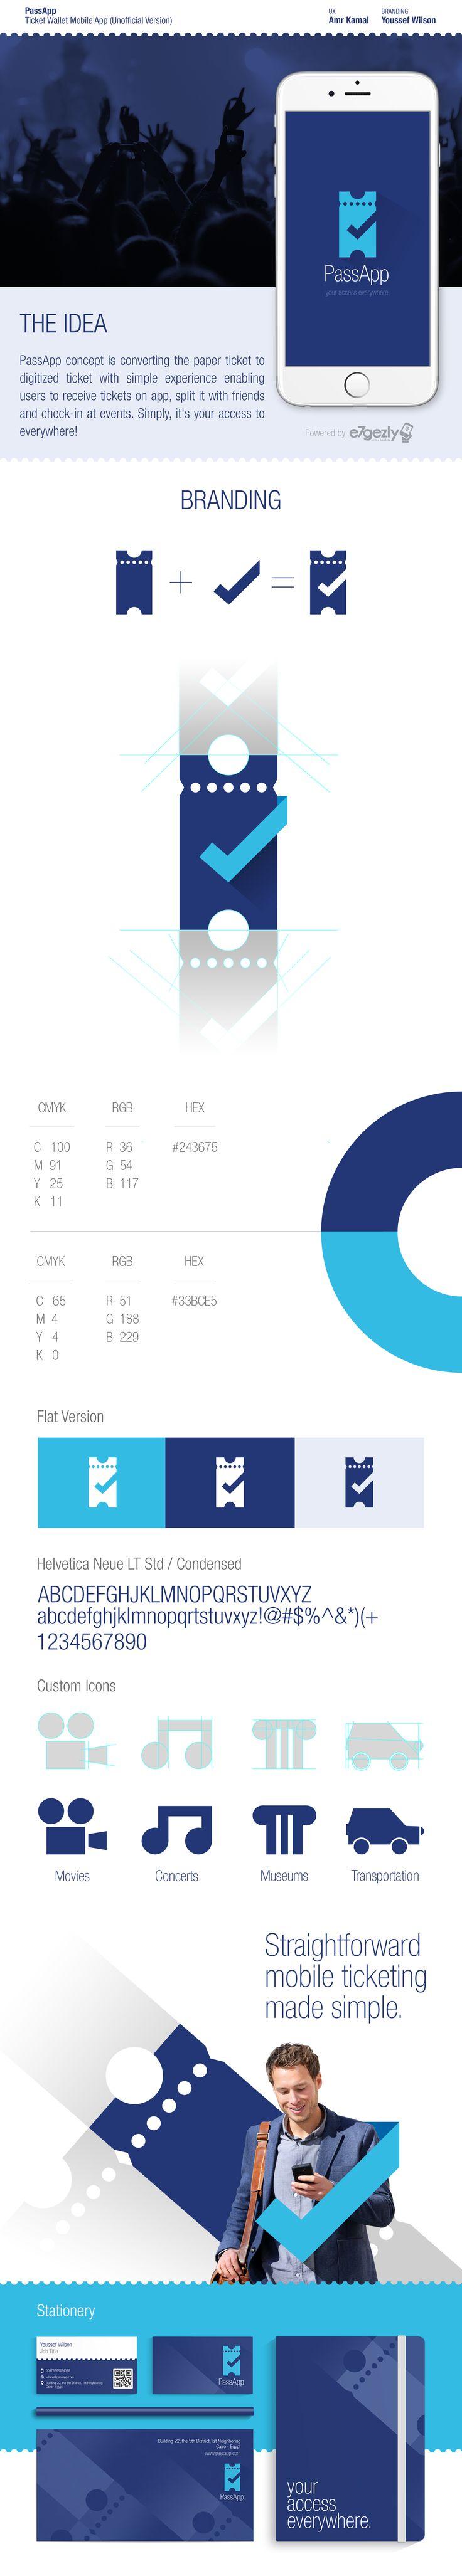 PassApp | Ticket Wallet Mobile App on Behance